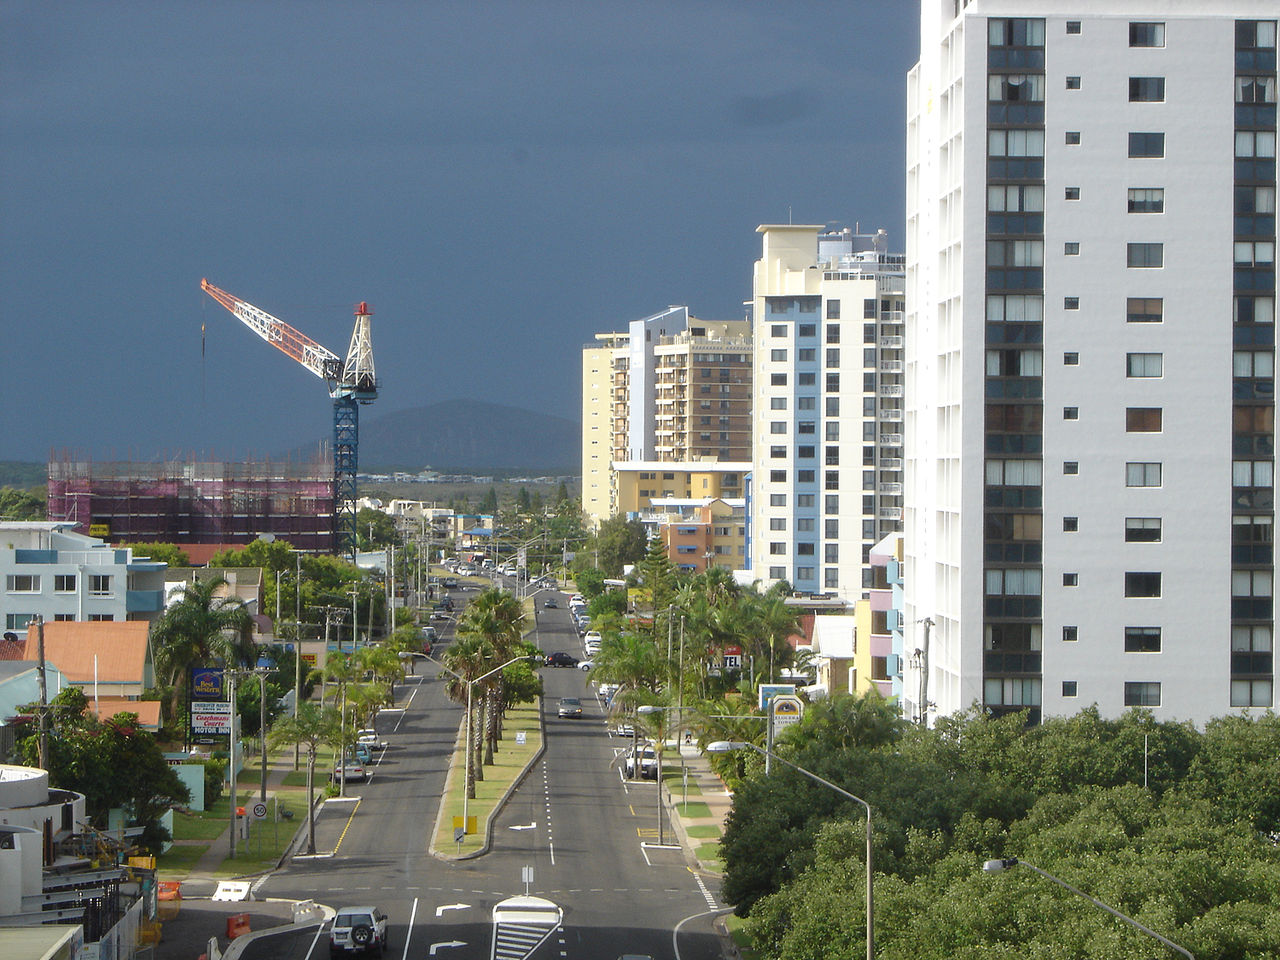 1280px-Maroochydore__Queensland_1.jpg